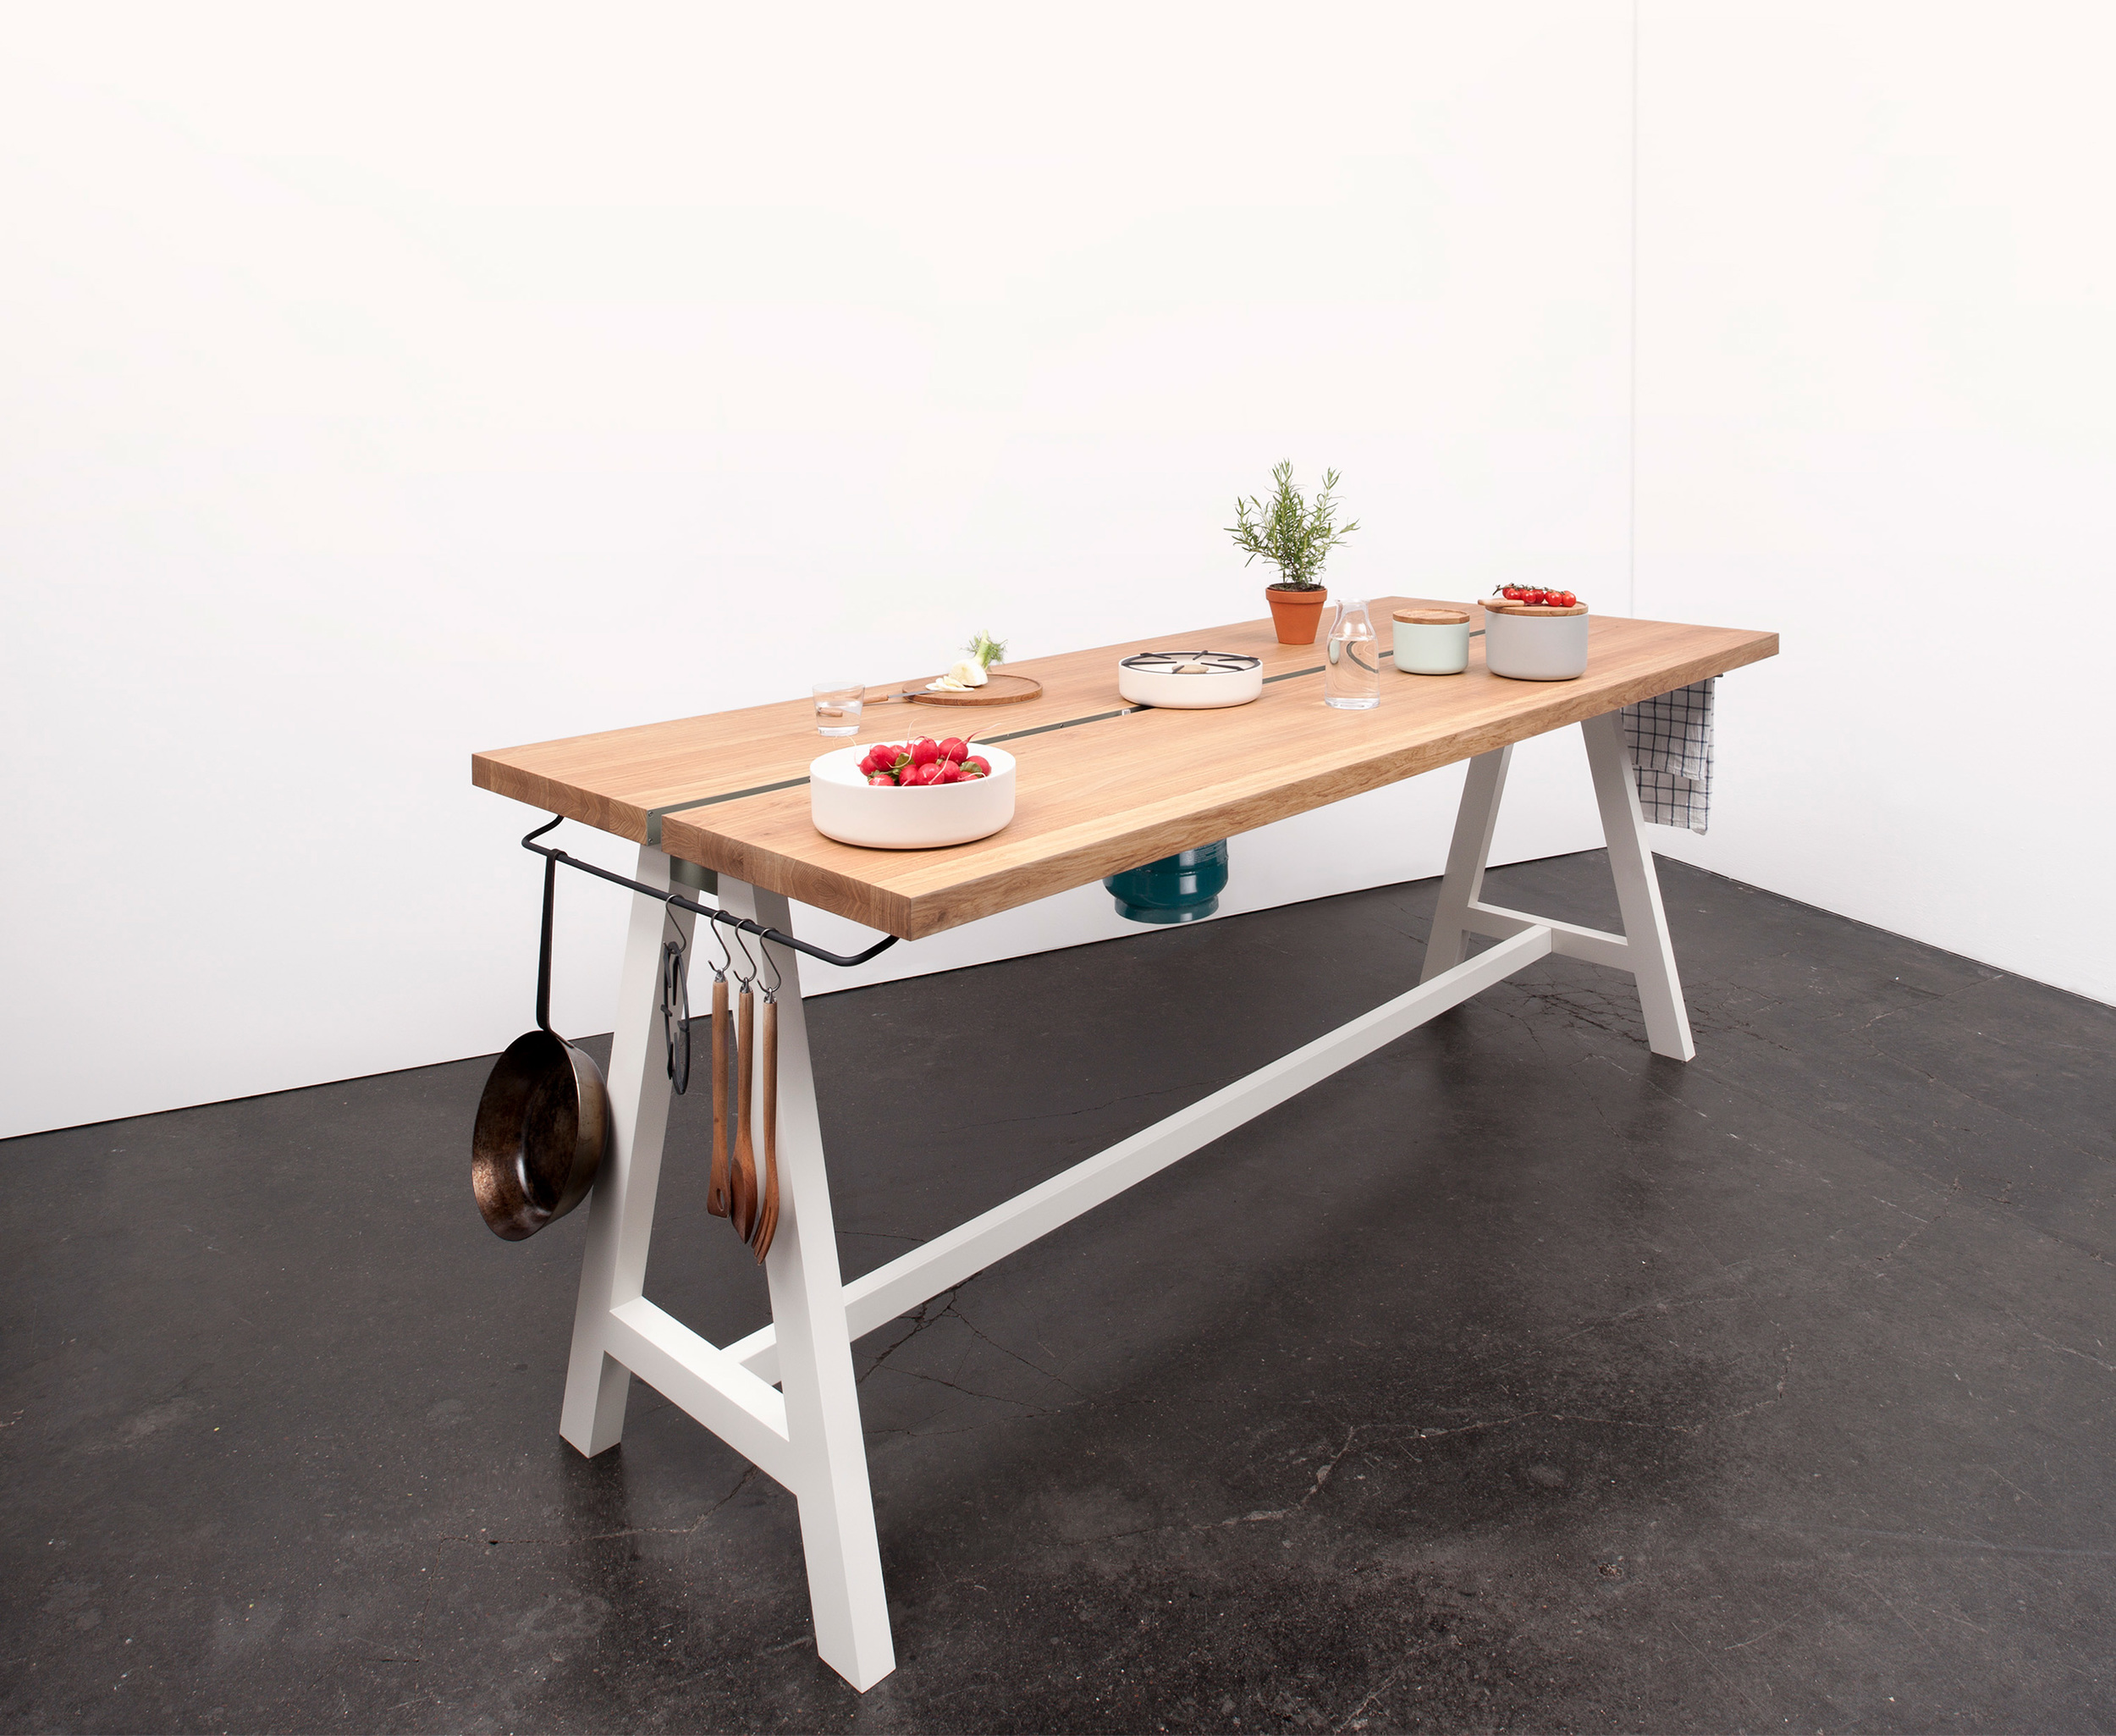 Studio-MoritzPutzier_The-Cooking-Table-02.jpg